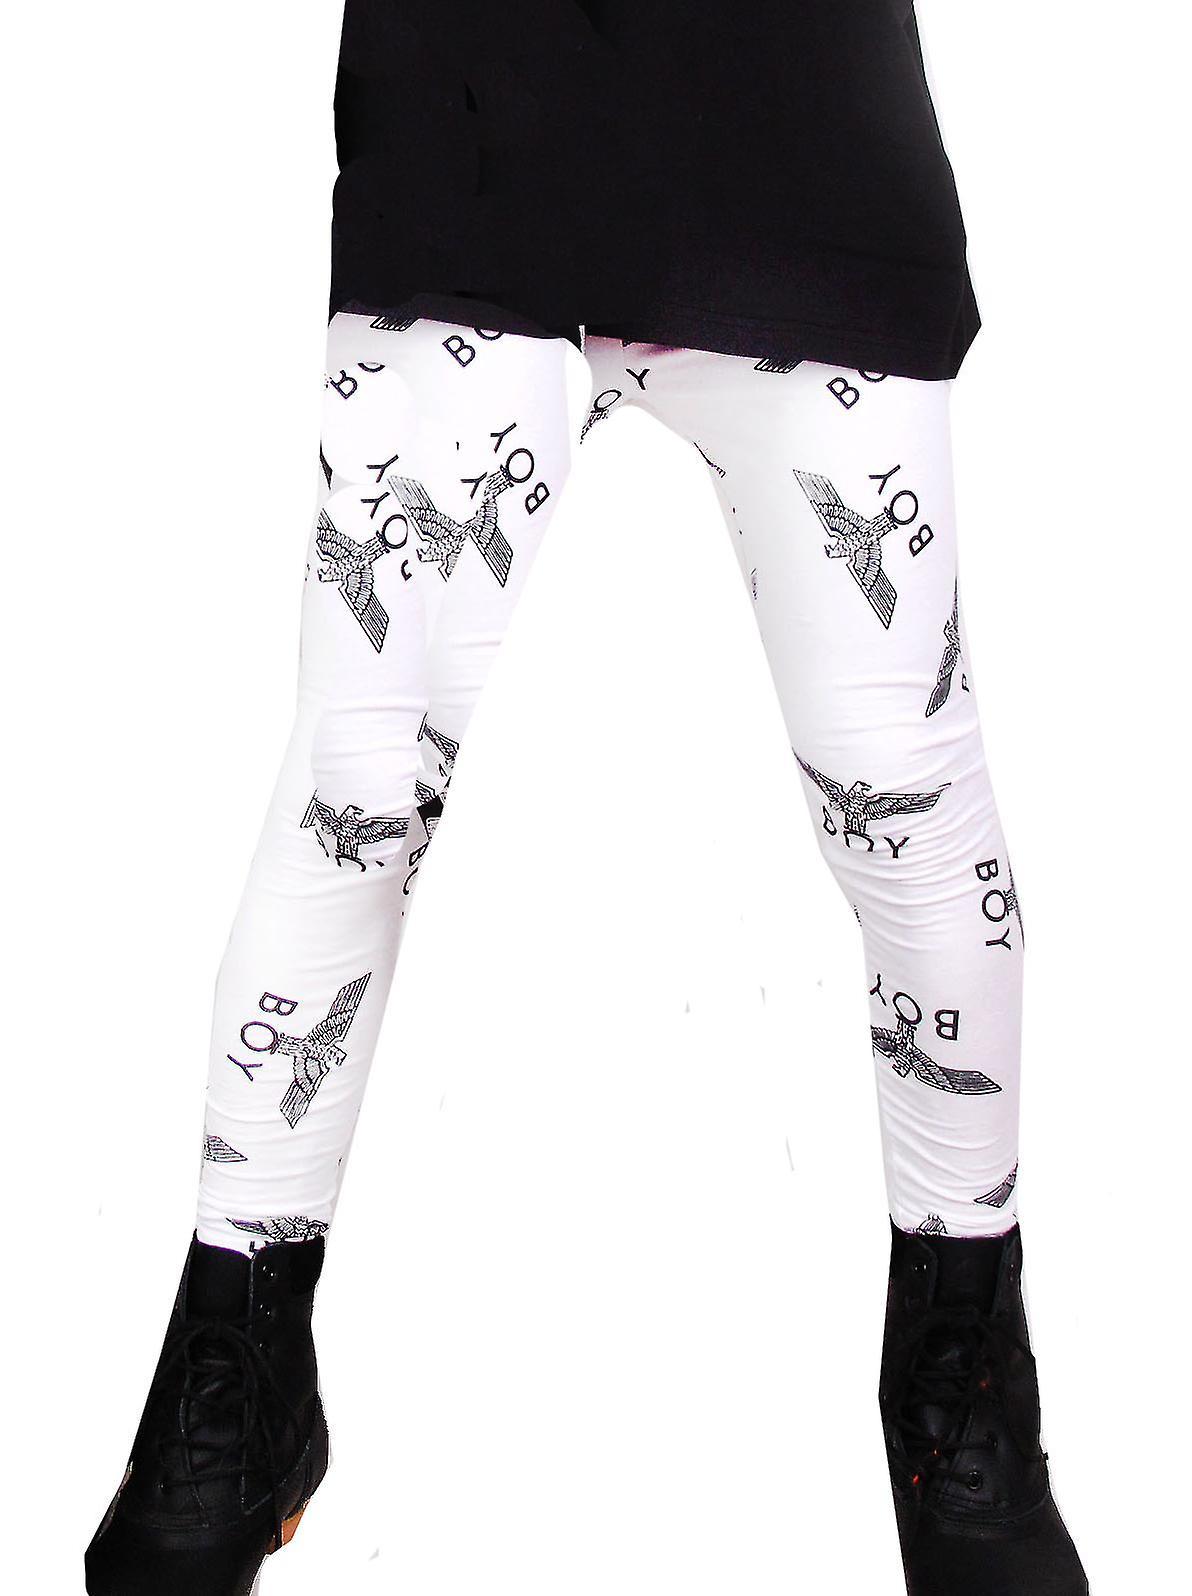 Waooh - Mode - Legging motif aigle et boy